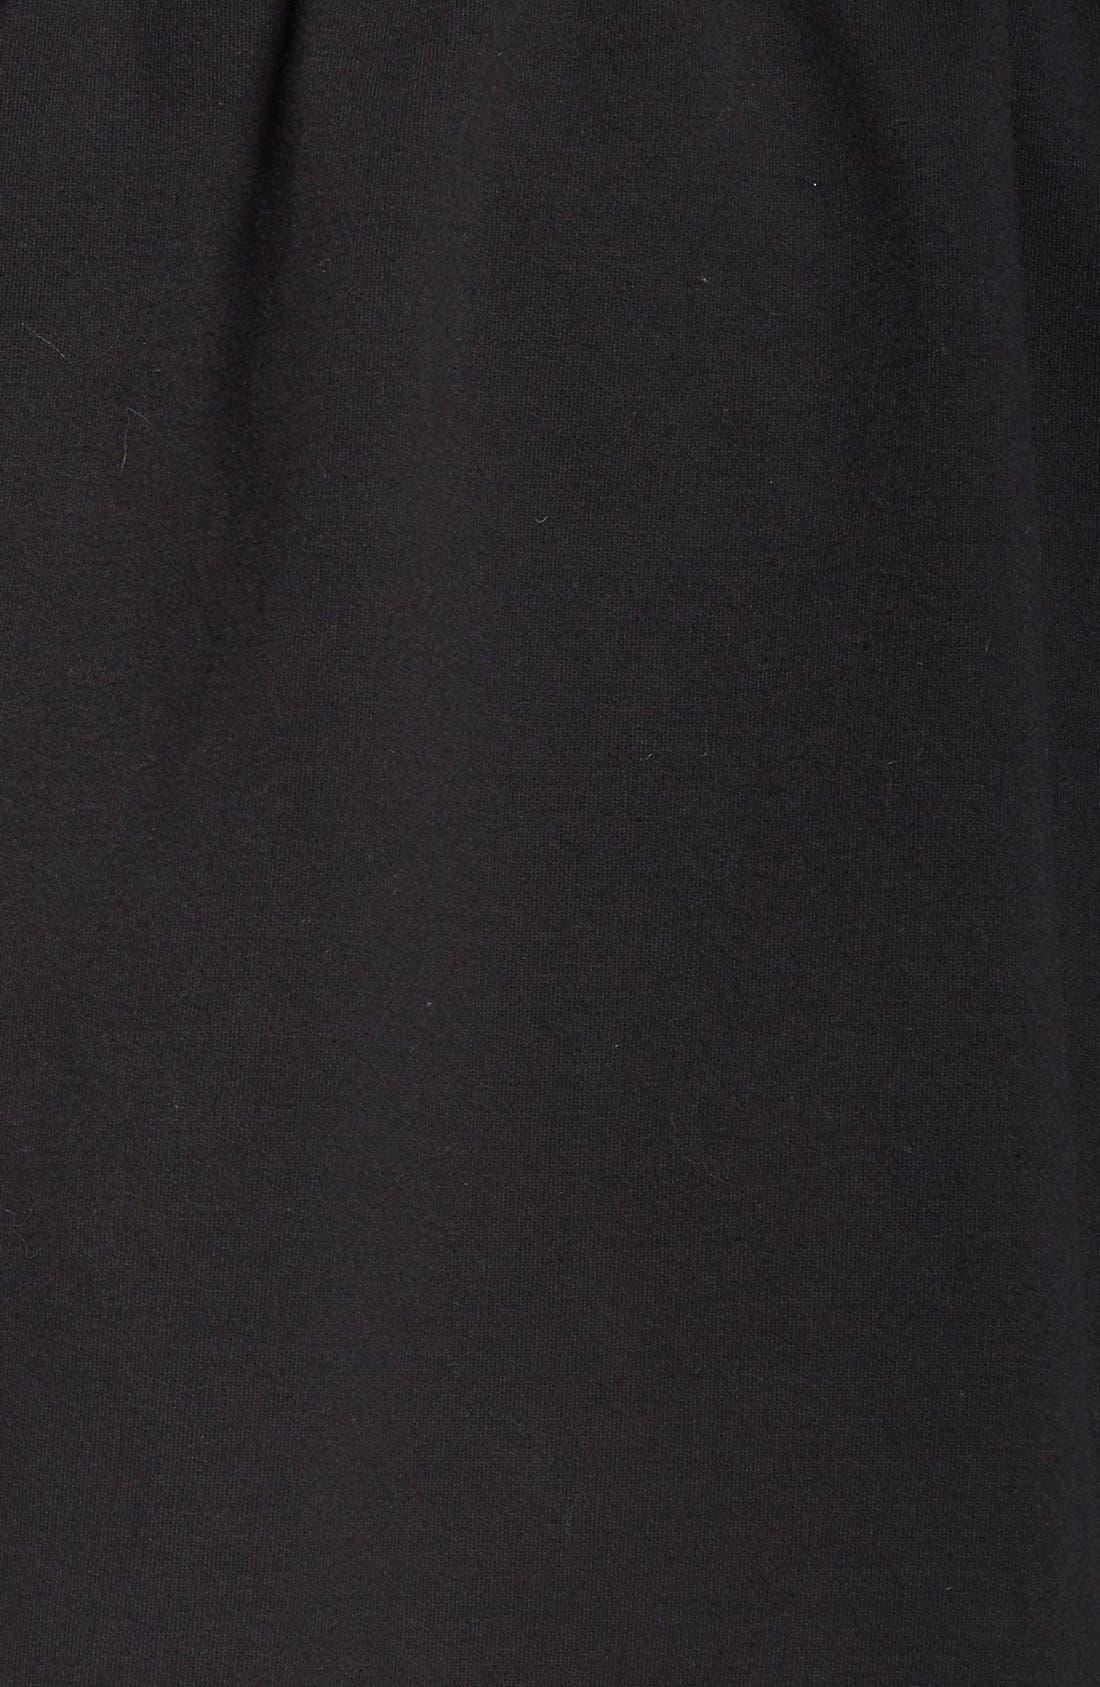 Traveler Wrap Jacket,                             Alternate thumbnail 8, color,                             BLACK/ BLACK